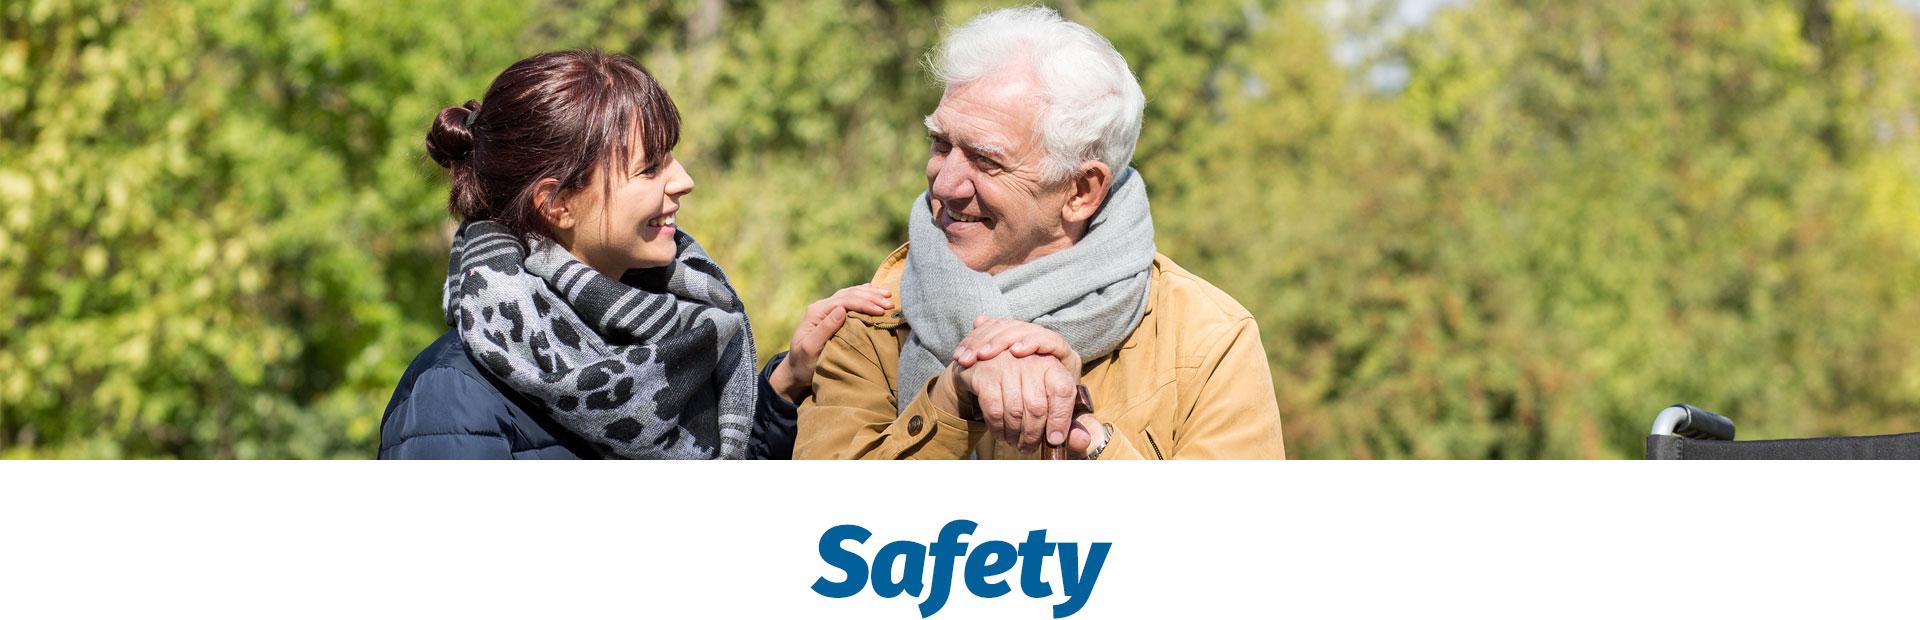 kleinlife safety, active adult community safety, senior safety